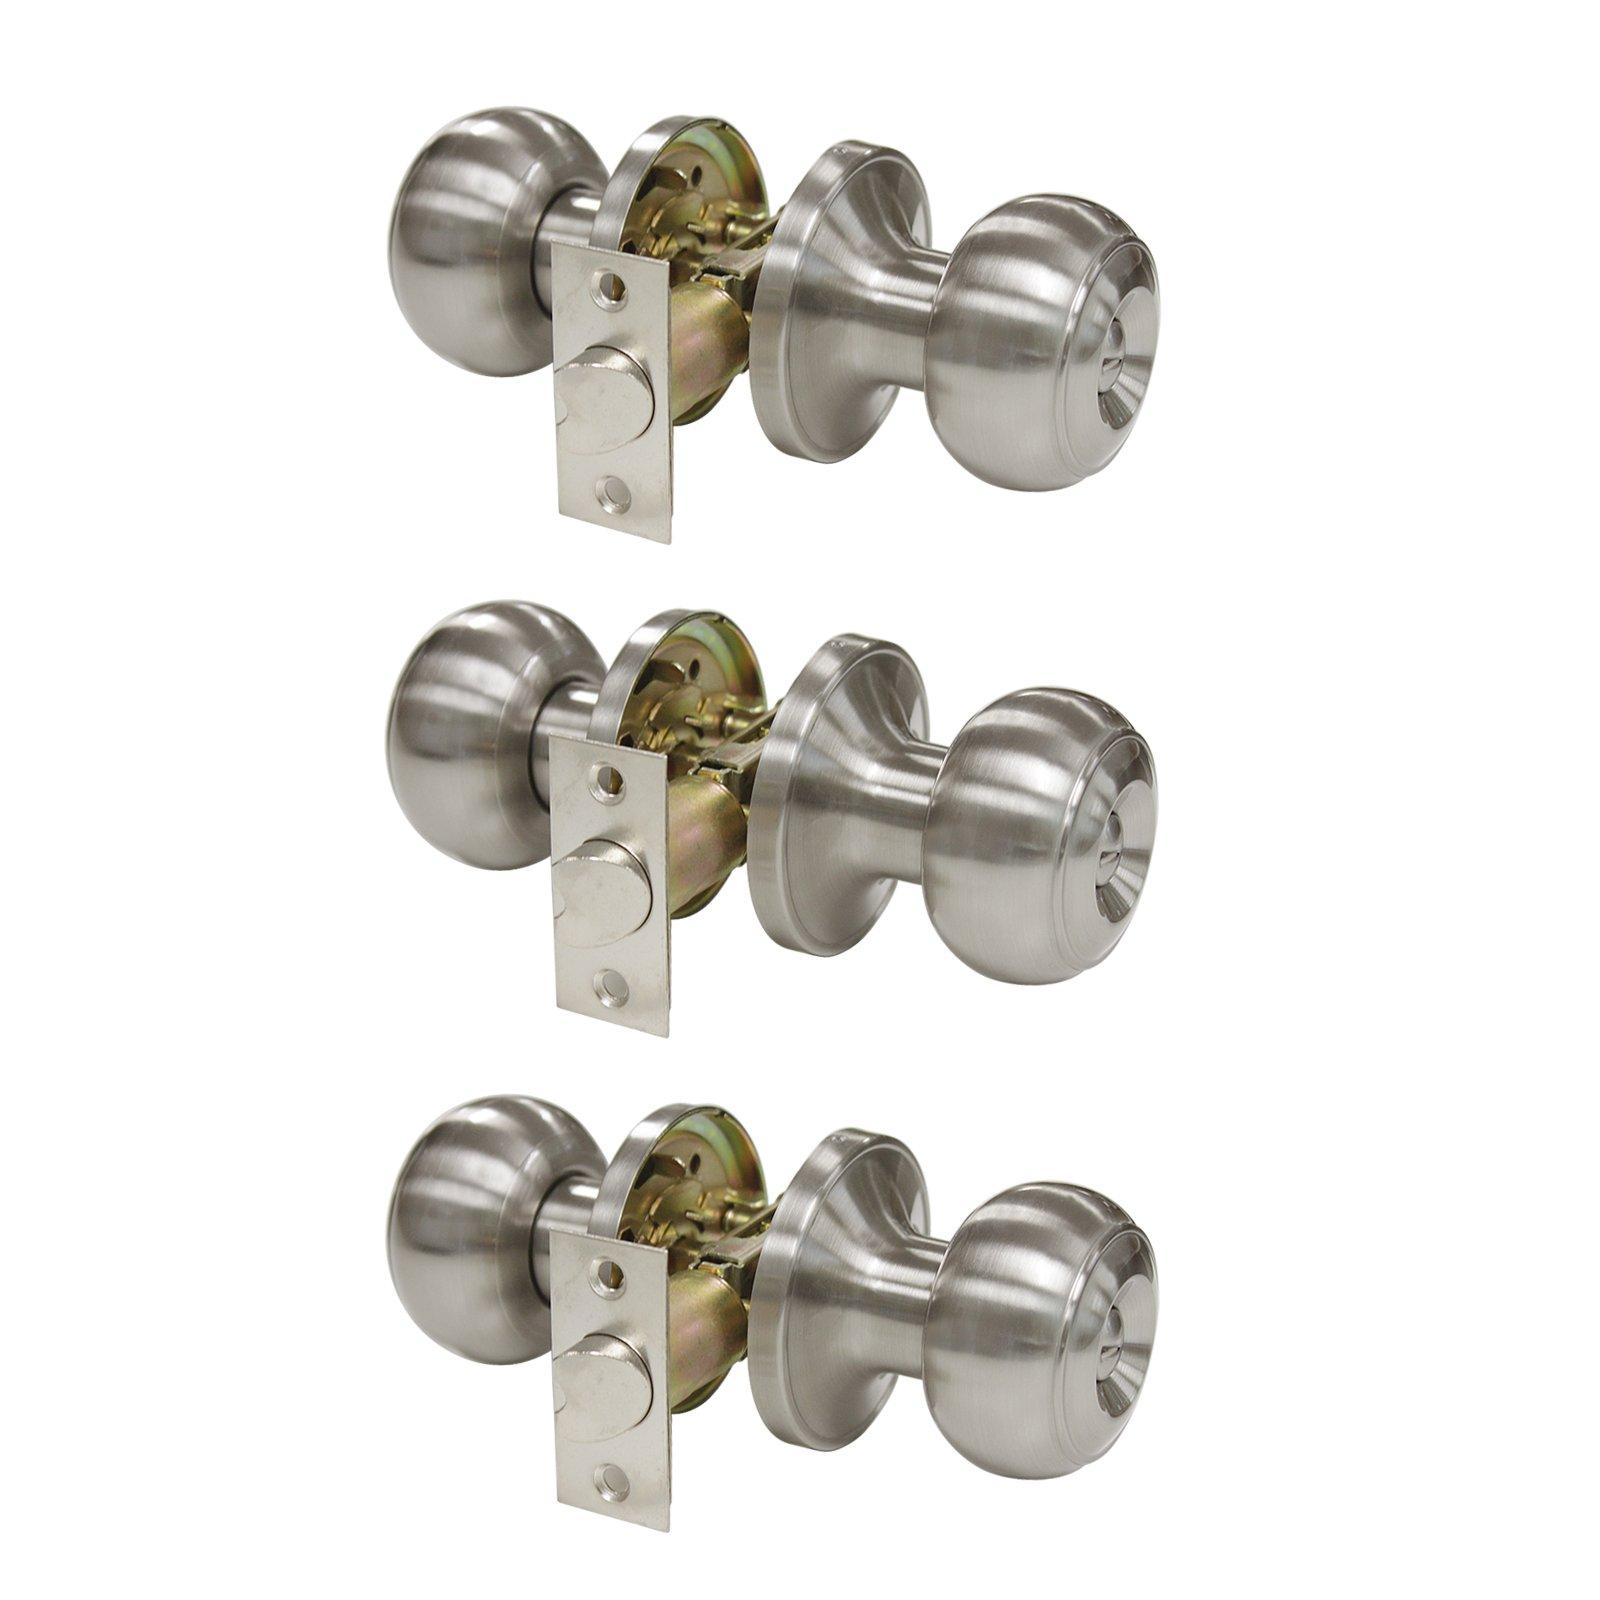 3 Pack Probrico Privacy Door Lock Storage Room Bathroom Keyless Door Knobs with lock no keys Lockset Round Knob set Brushed Satin Nickel-Privacy Keyless Knob-609